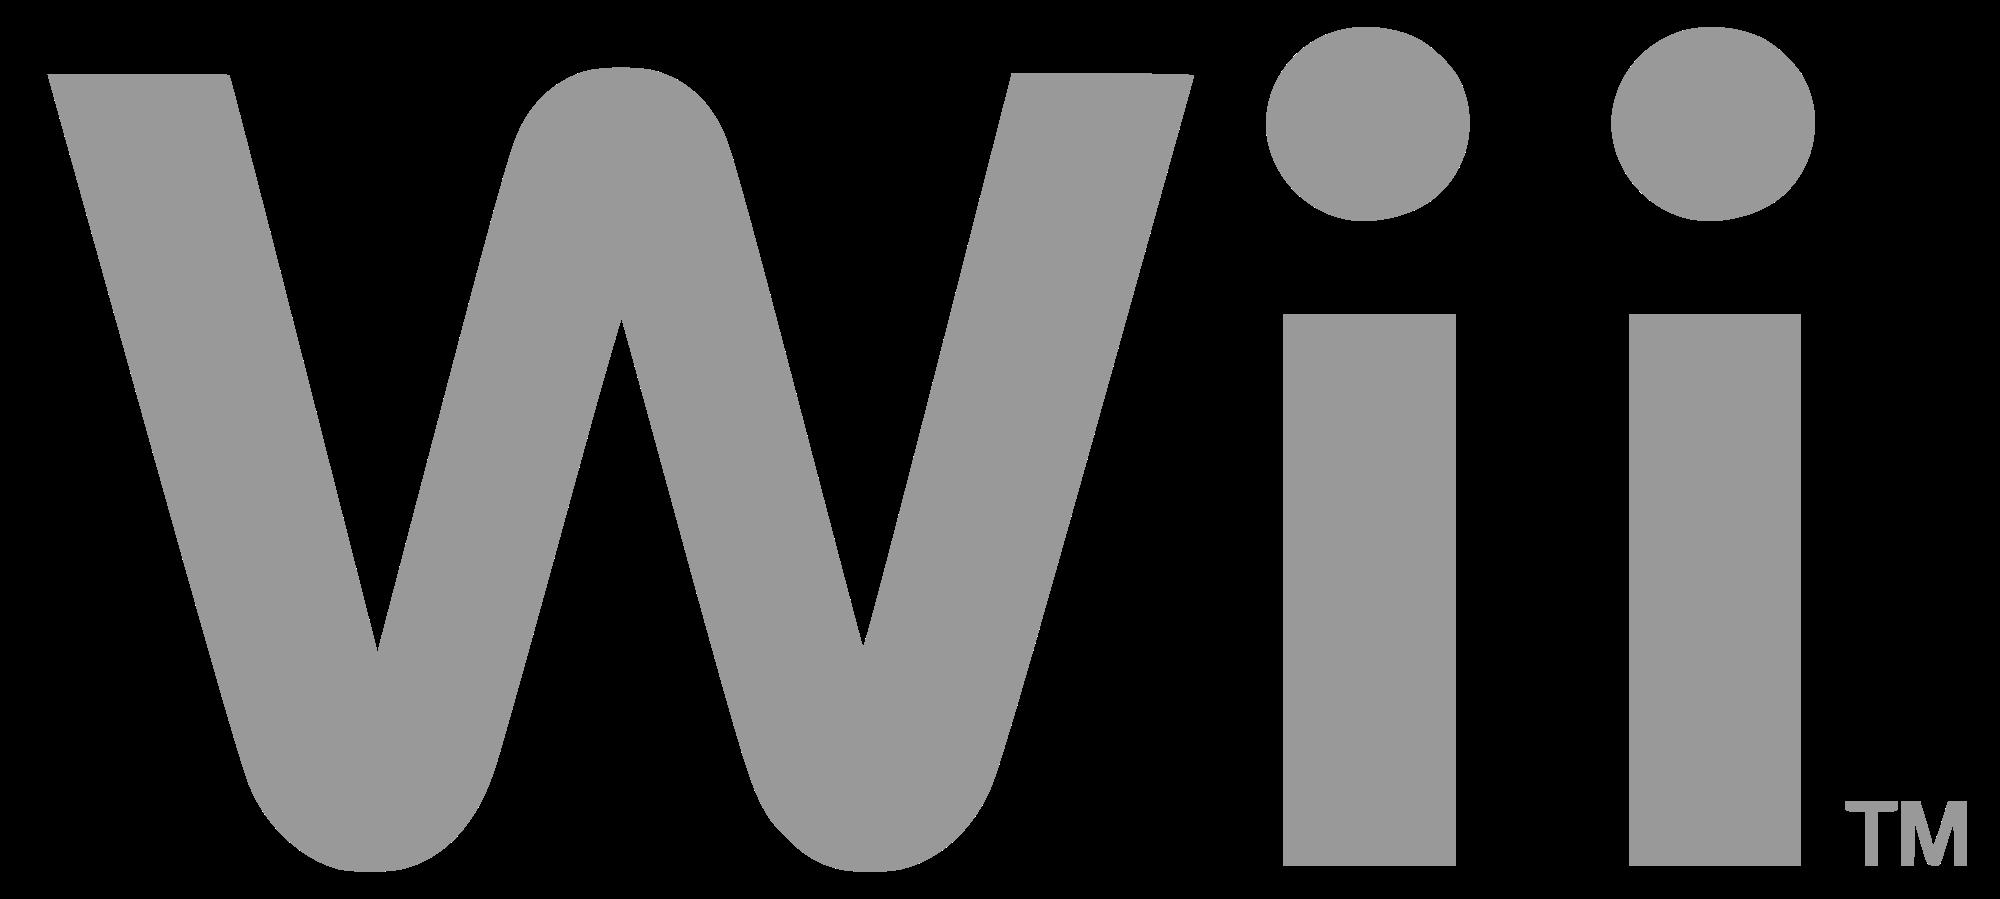 Wii Logo Png Image - Nintendo Wii L...